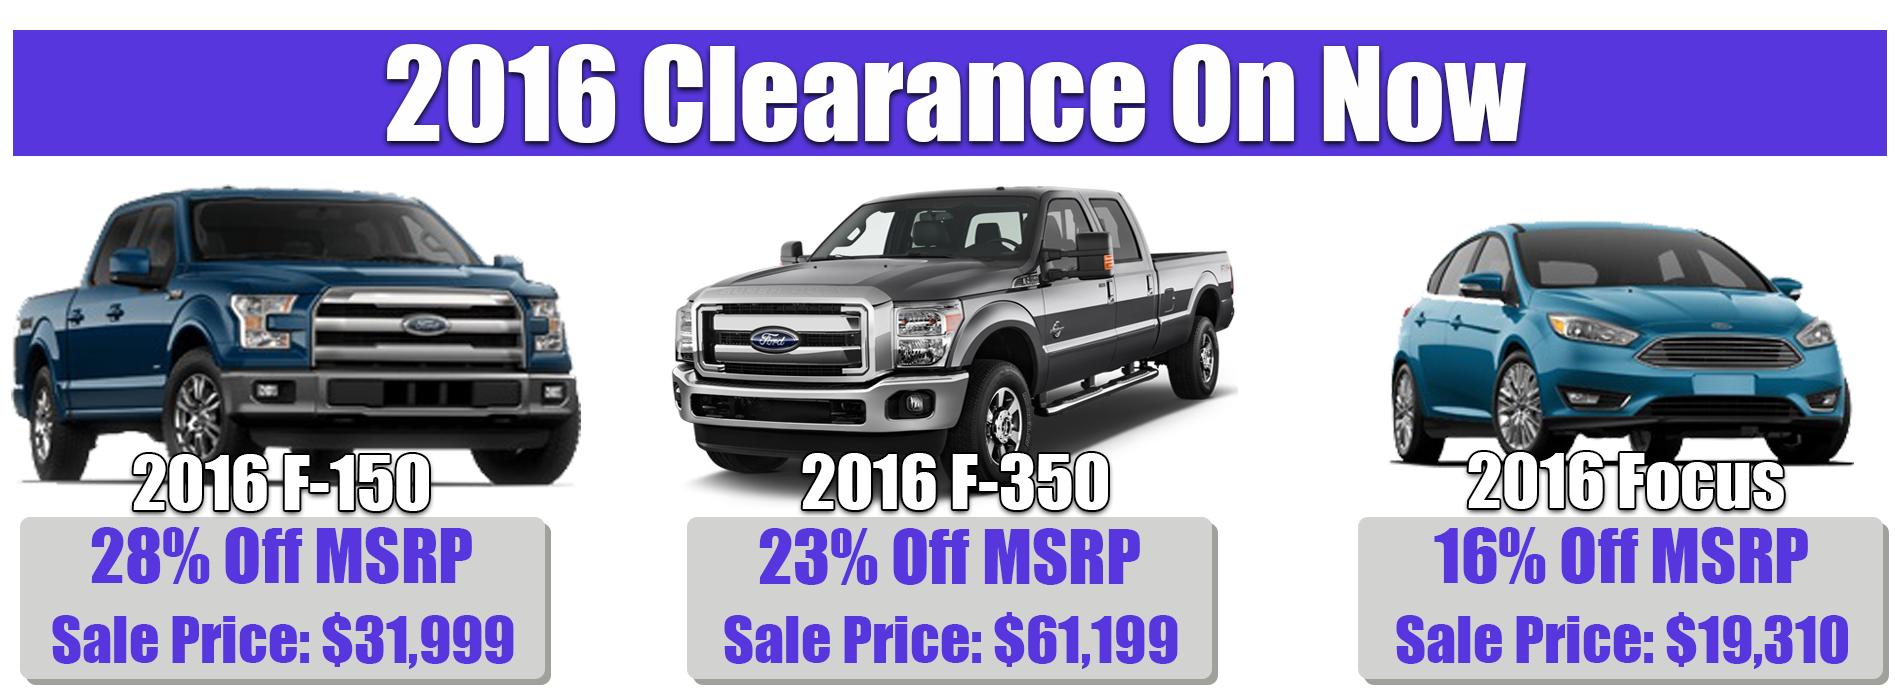 2016 Model Clearance